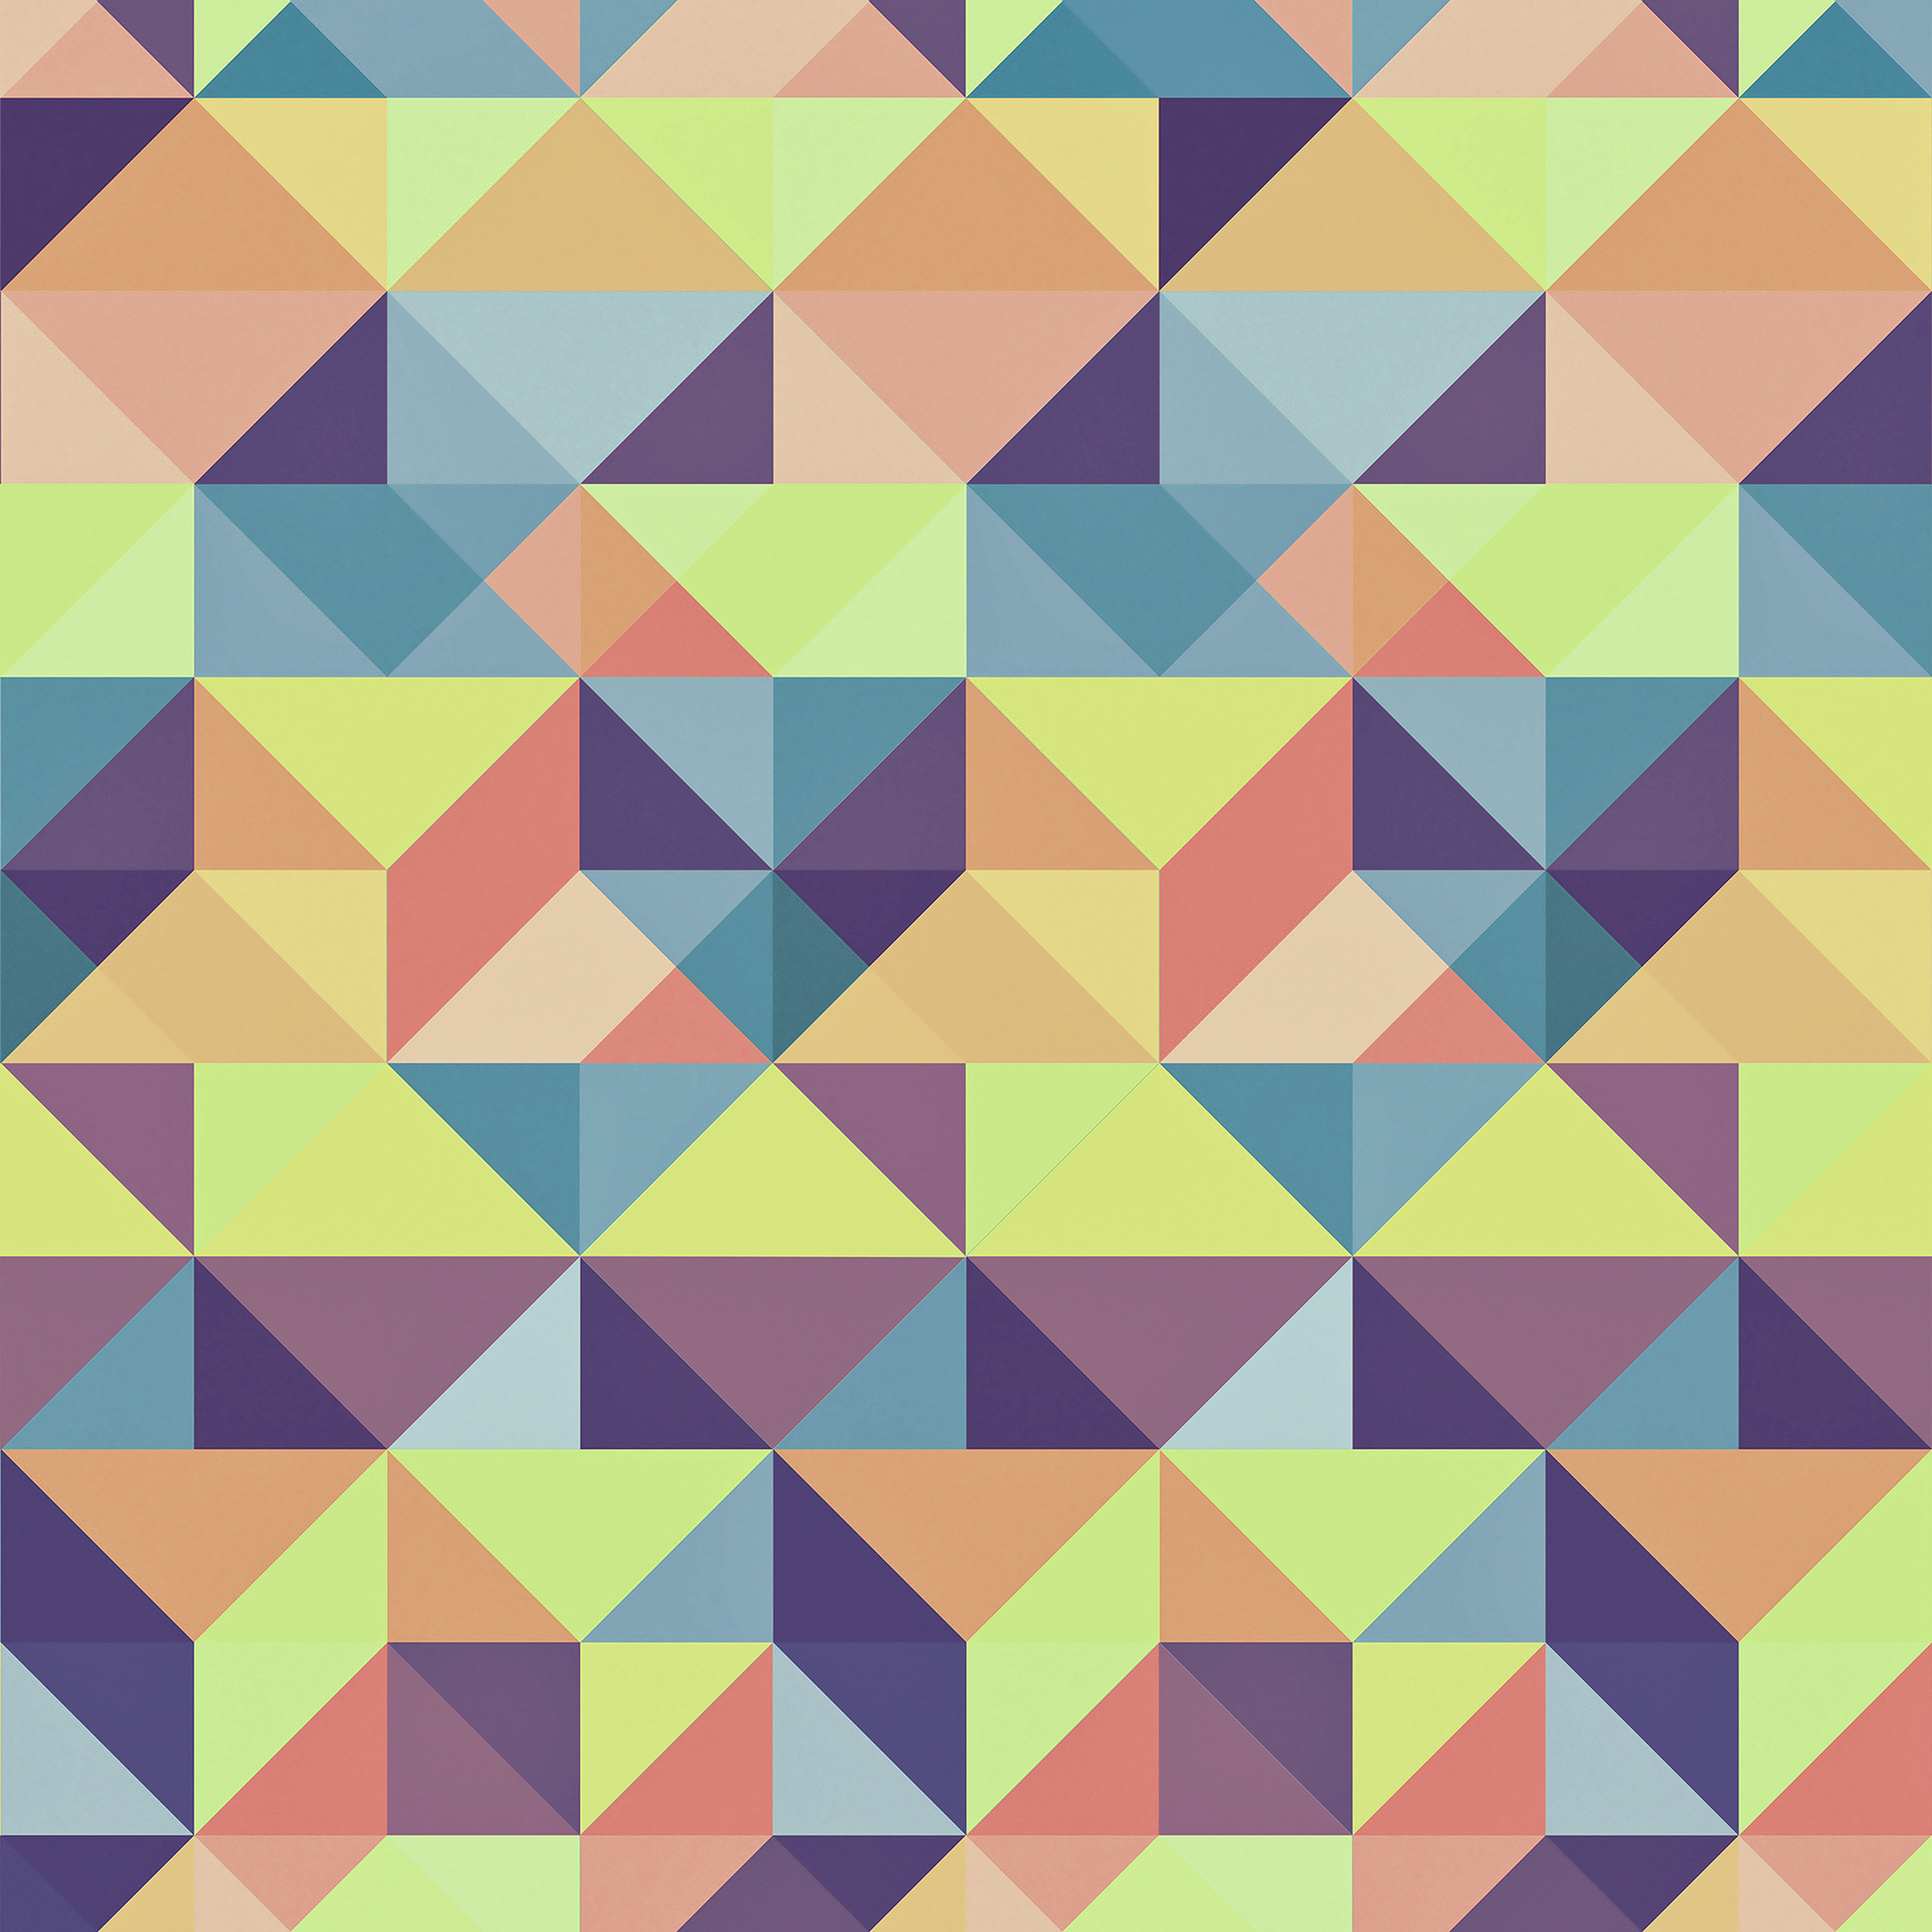 Cute Iphone Wallpaper Patterns Wallpapers